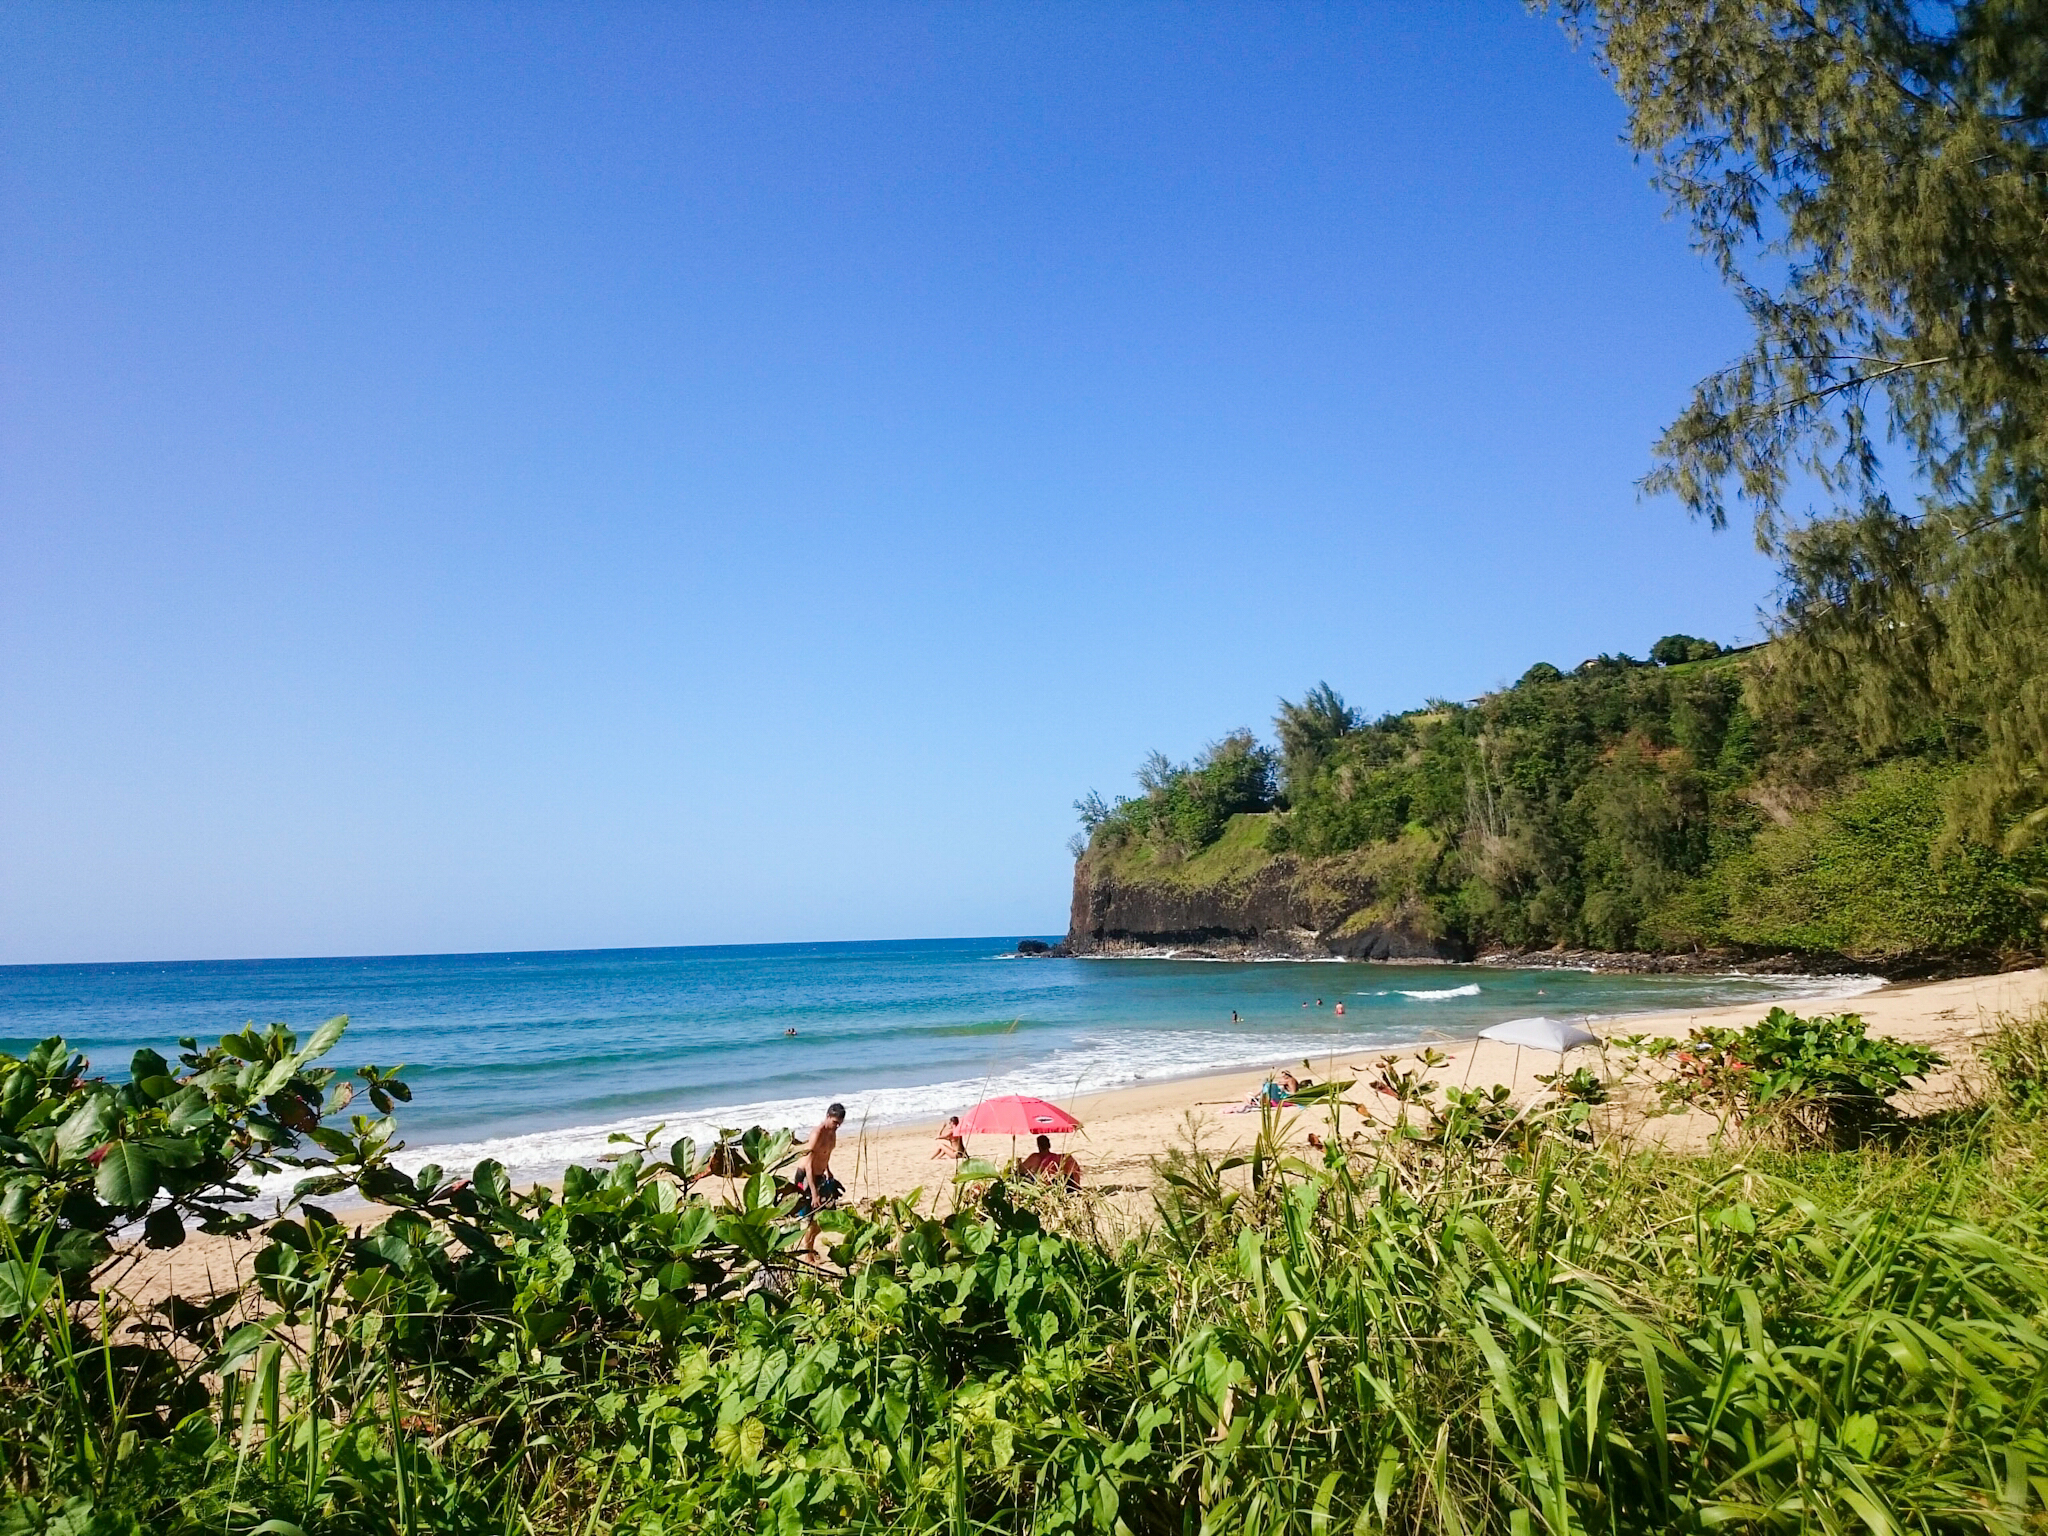 Plage de Kalihiwai à Kauai